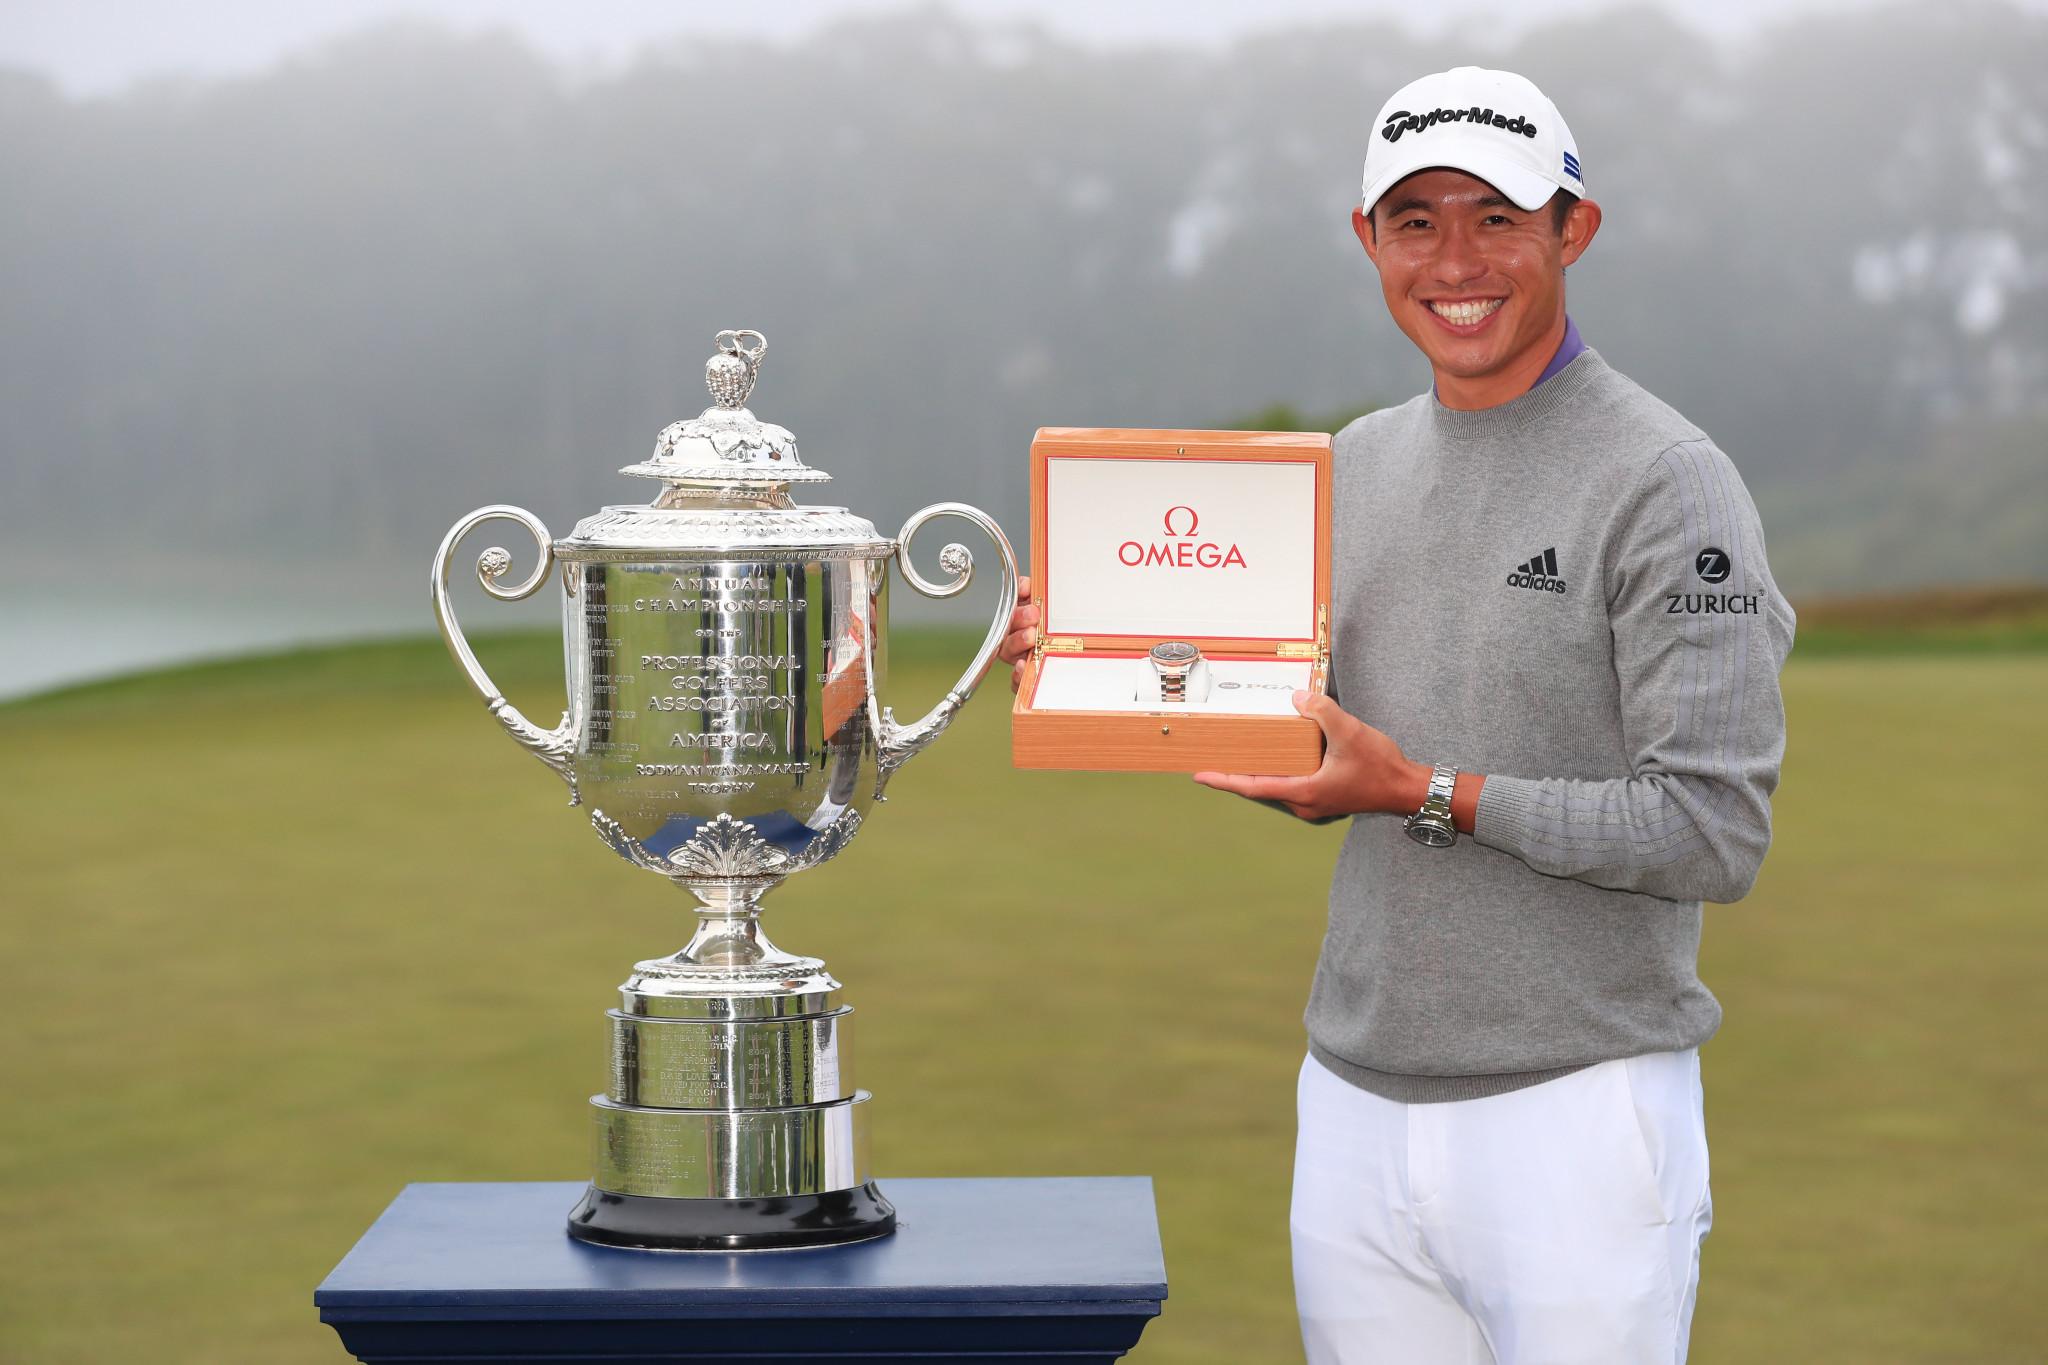 Morikawa wins PGA Championship to claim first major title